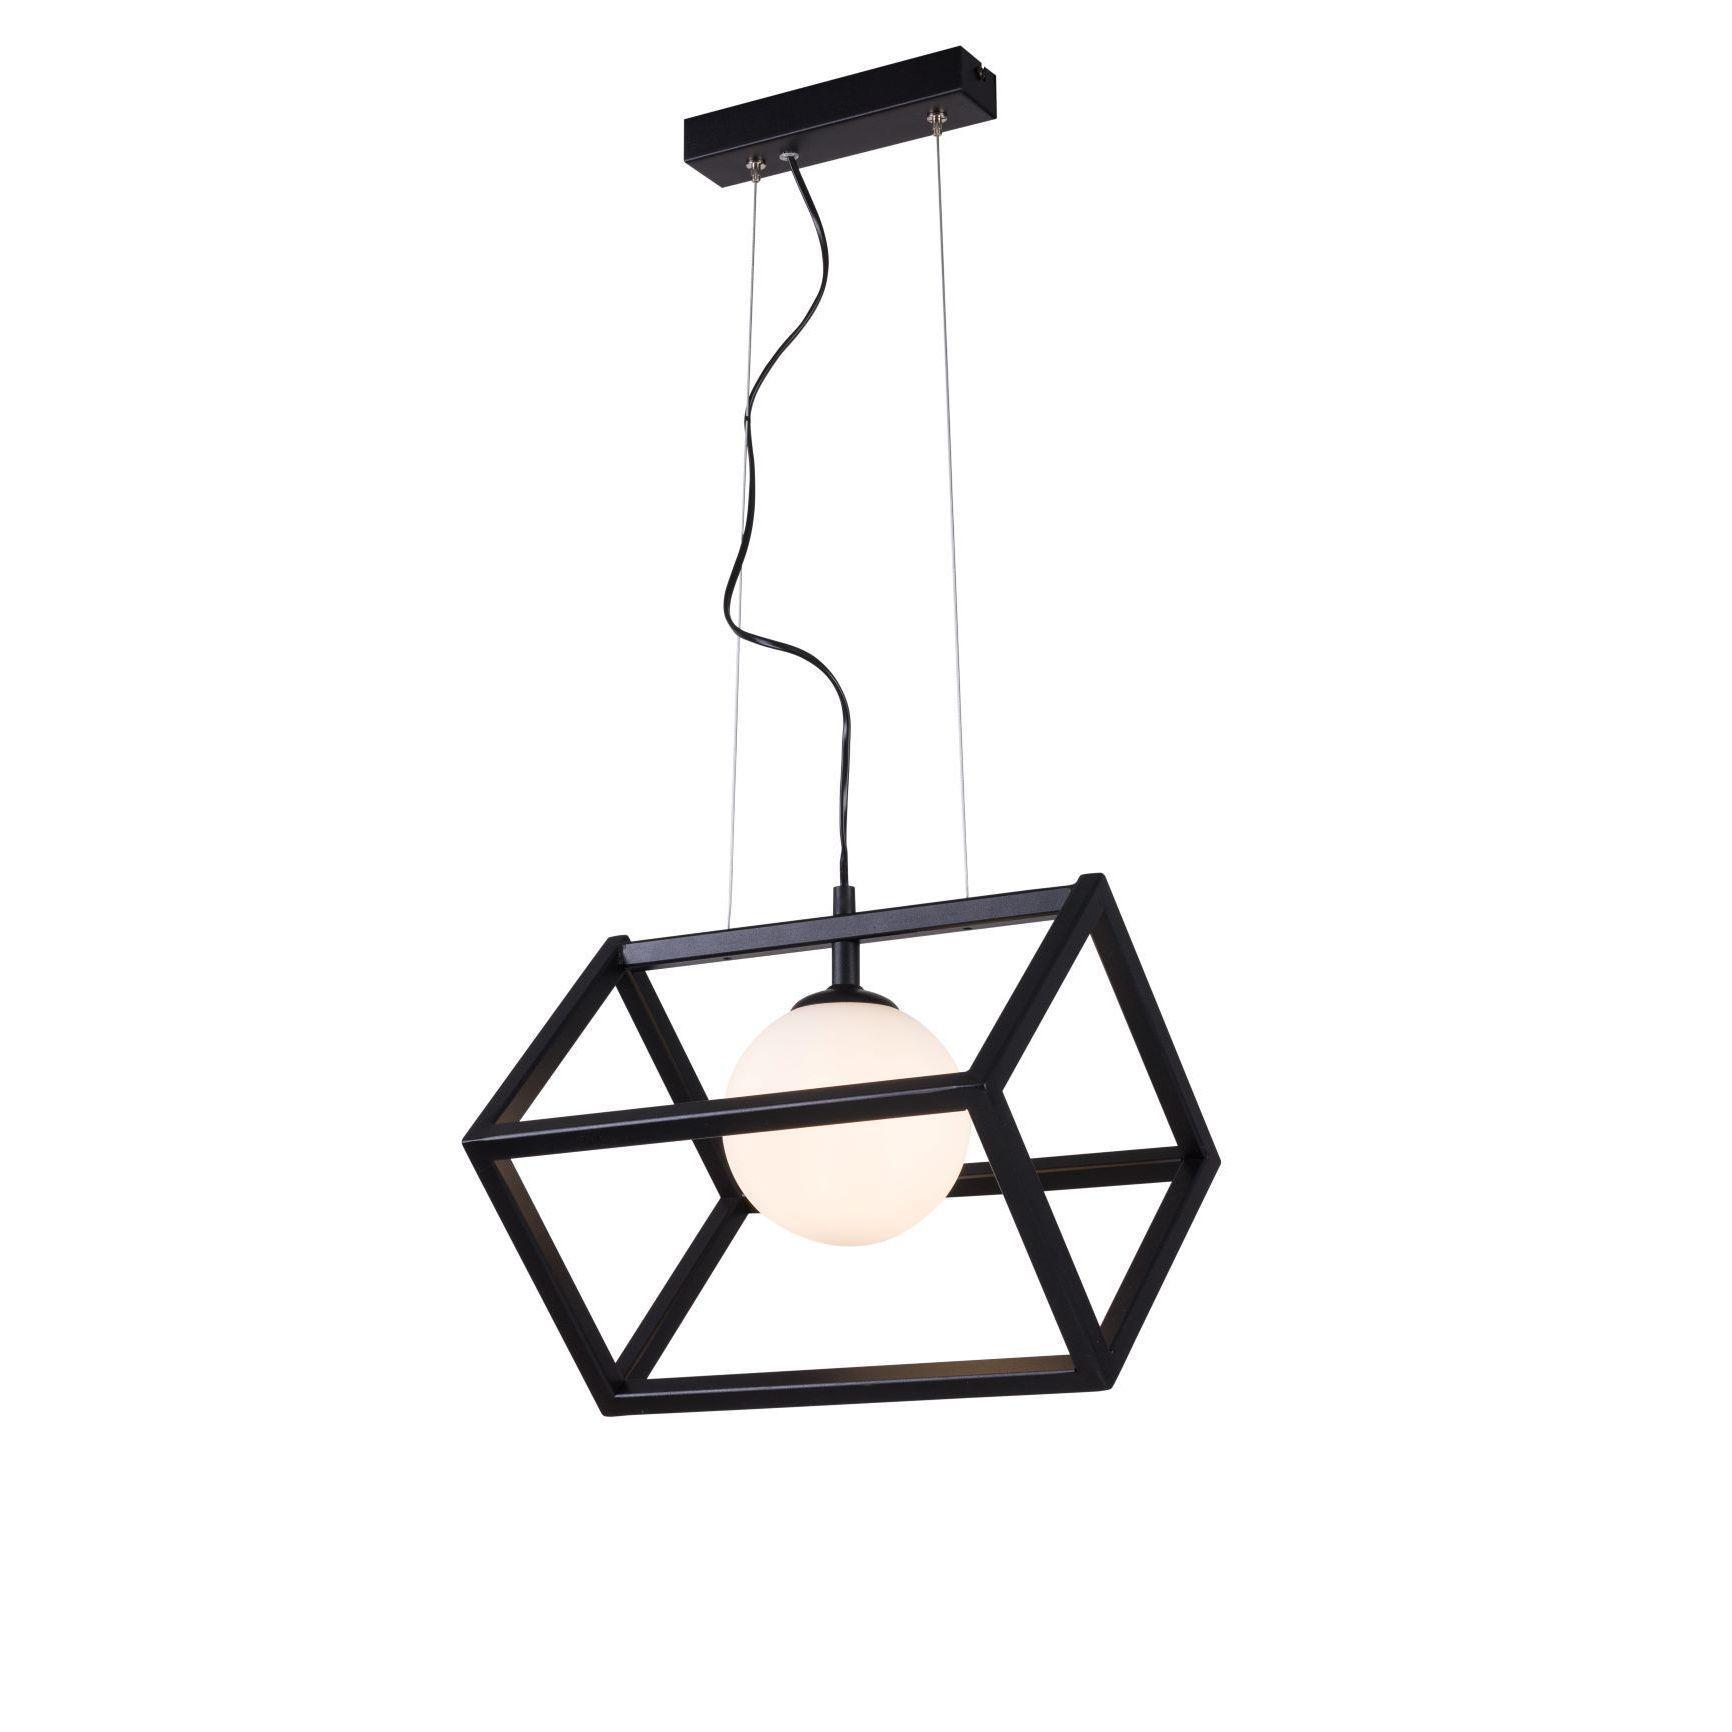 Lampa wisząca Aldex x1 Cube Glass Black 1027G1